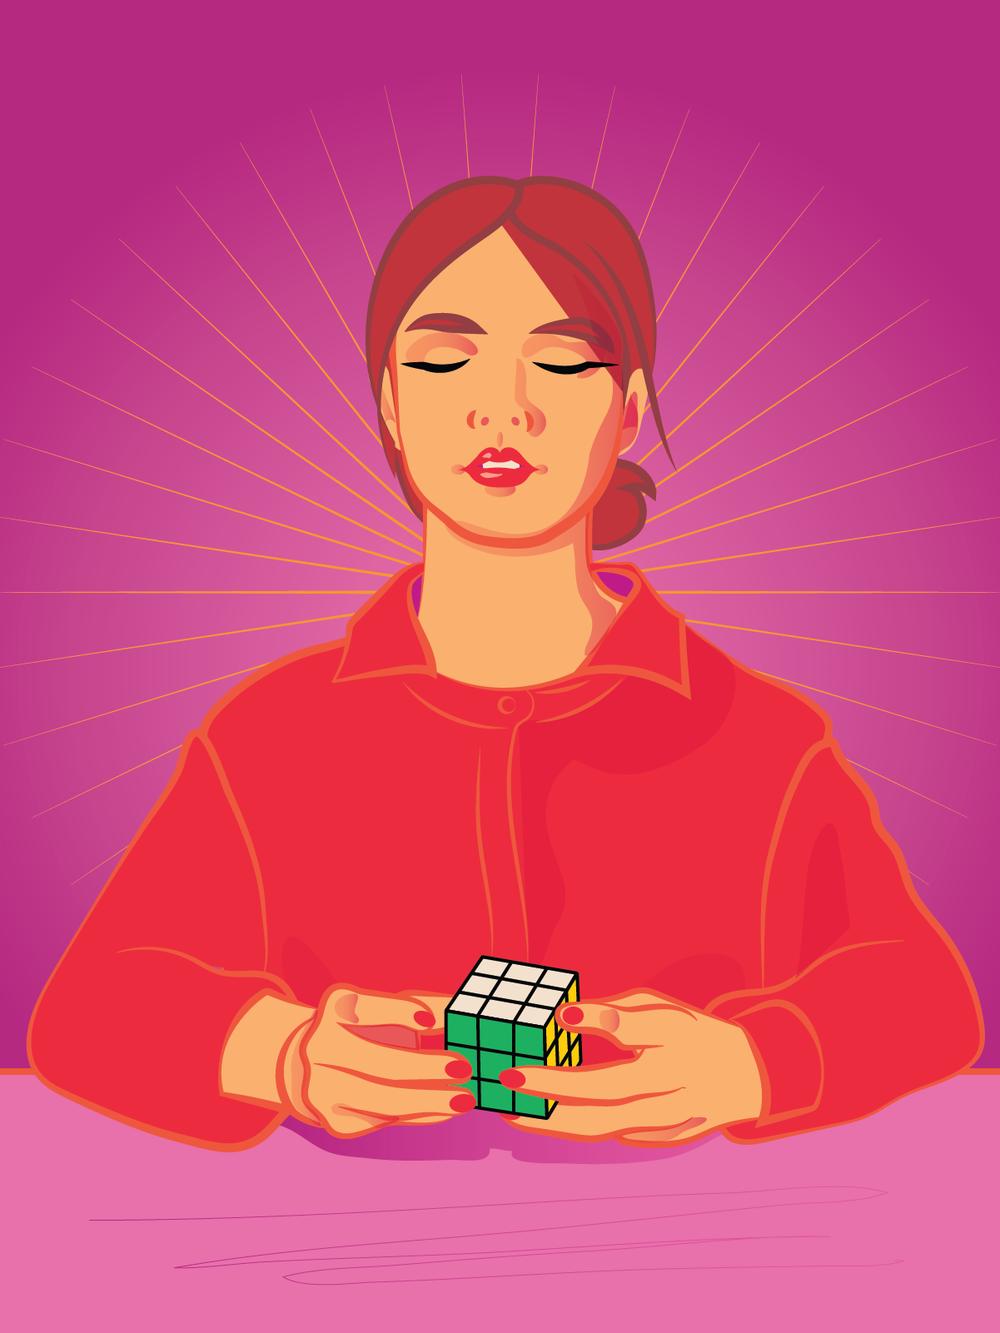 BigRoundtableMedium-RubiksCube-MarinaEsmeraldo.png